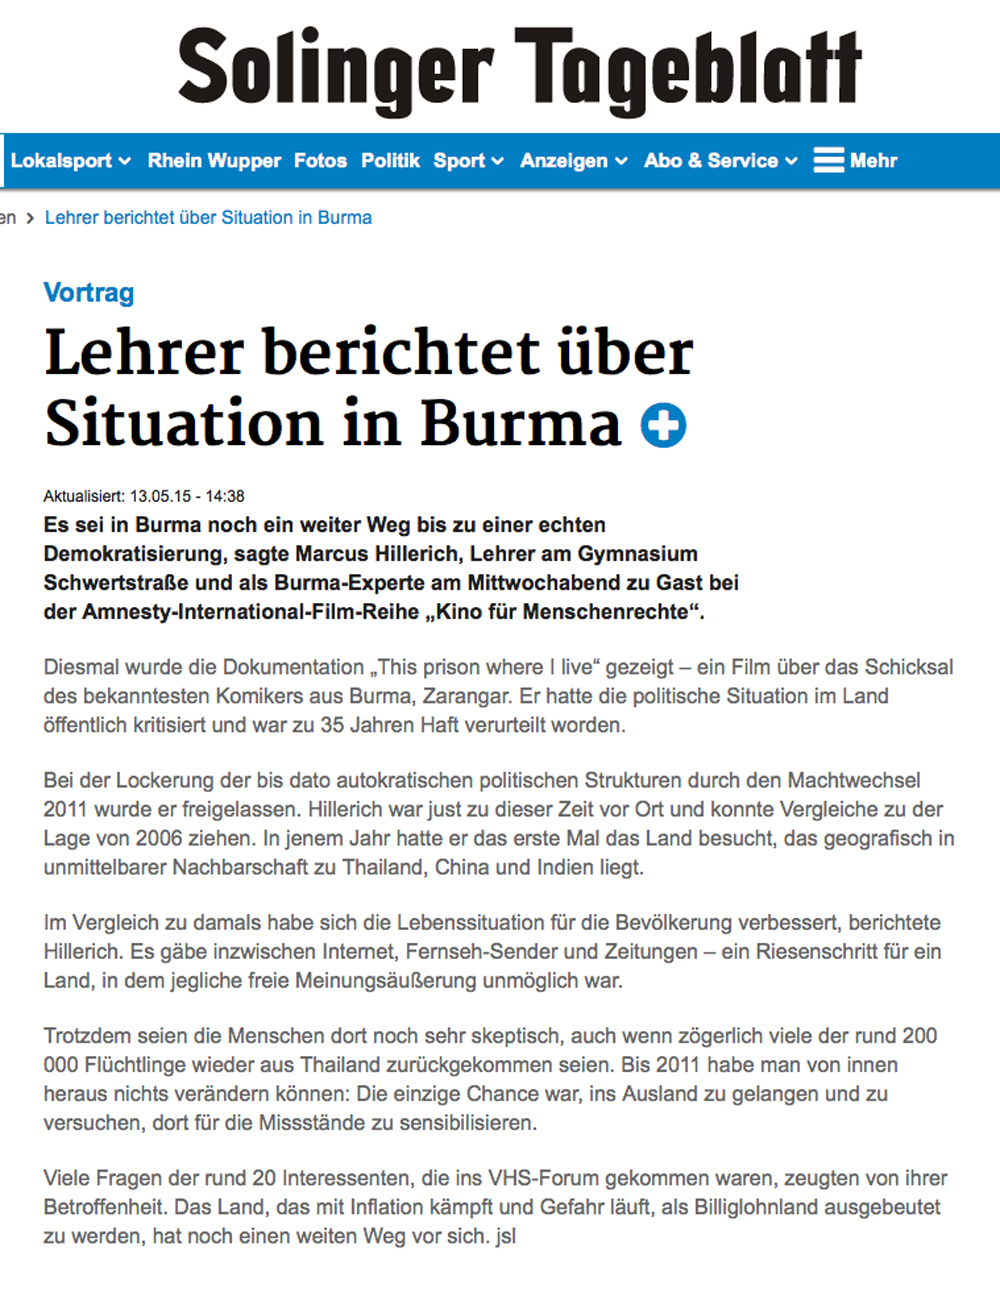 ST-Bericht über Burma